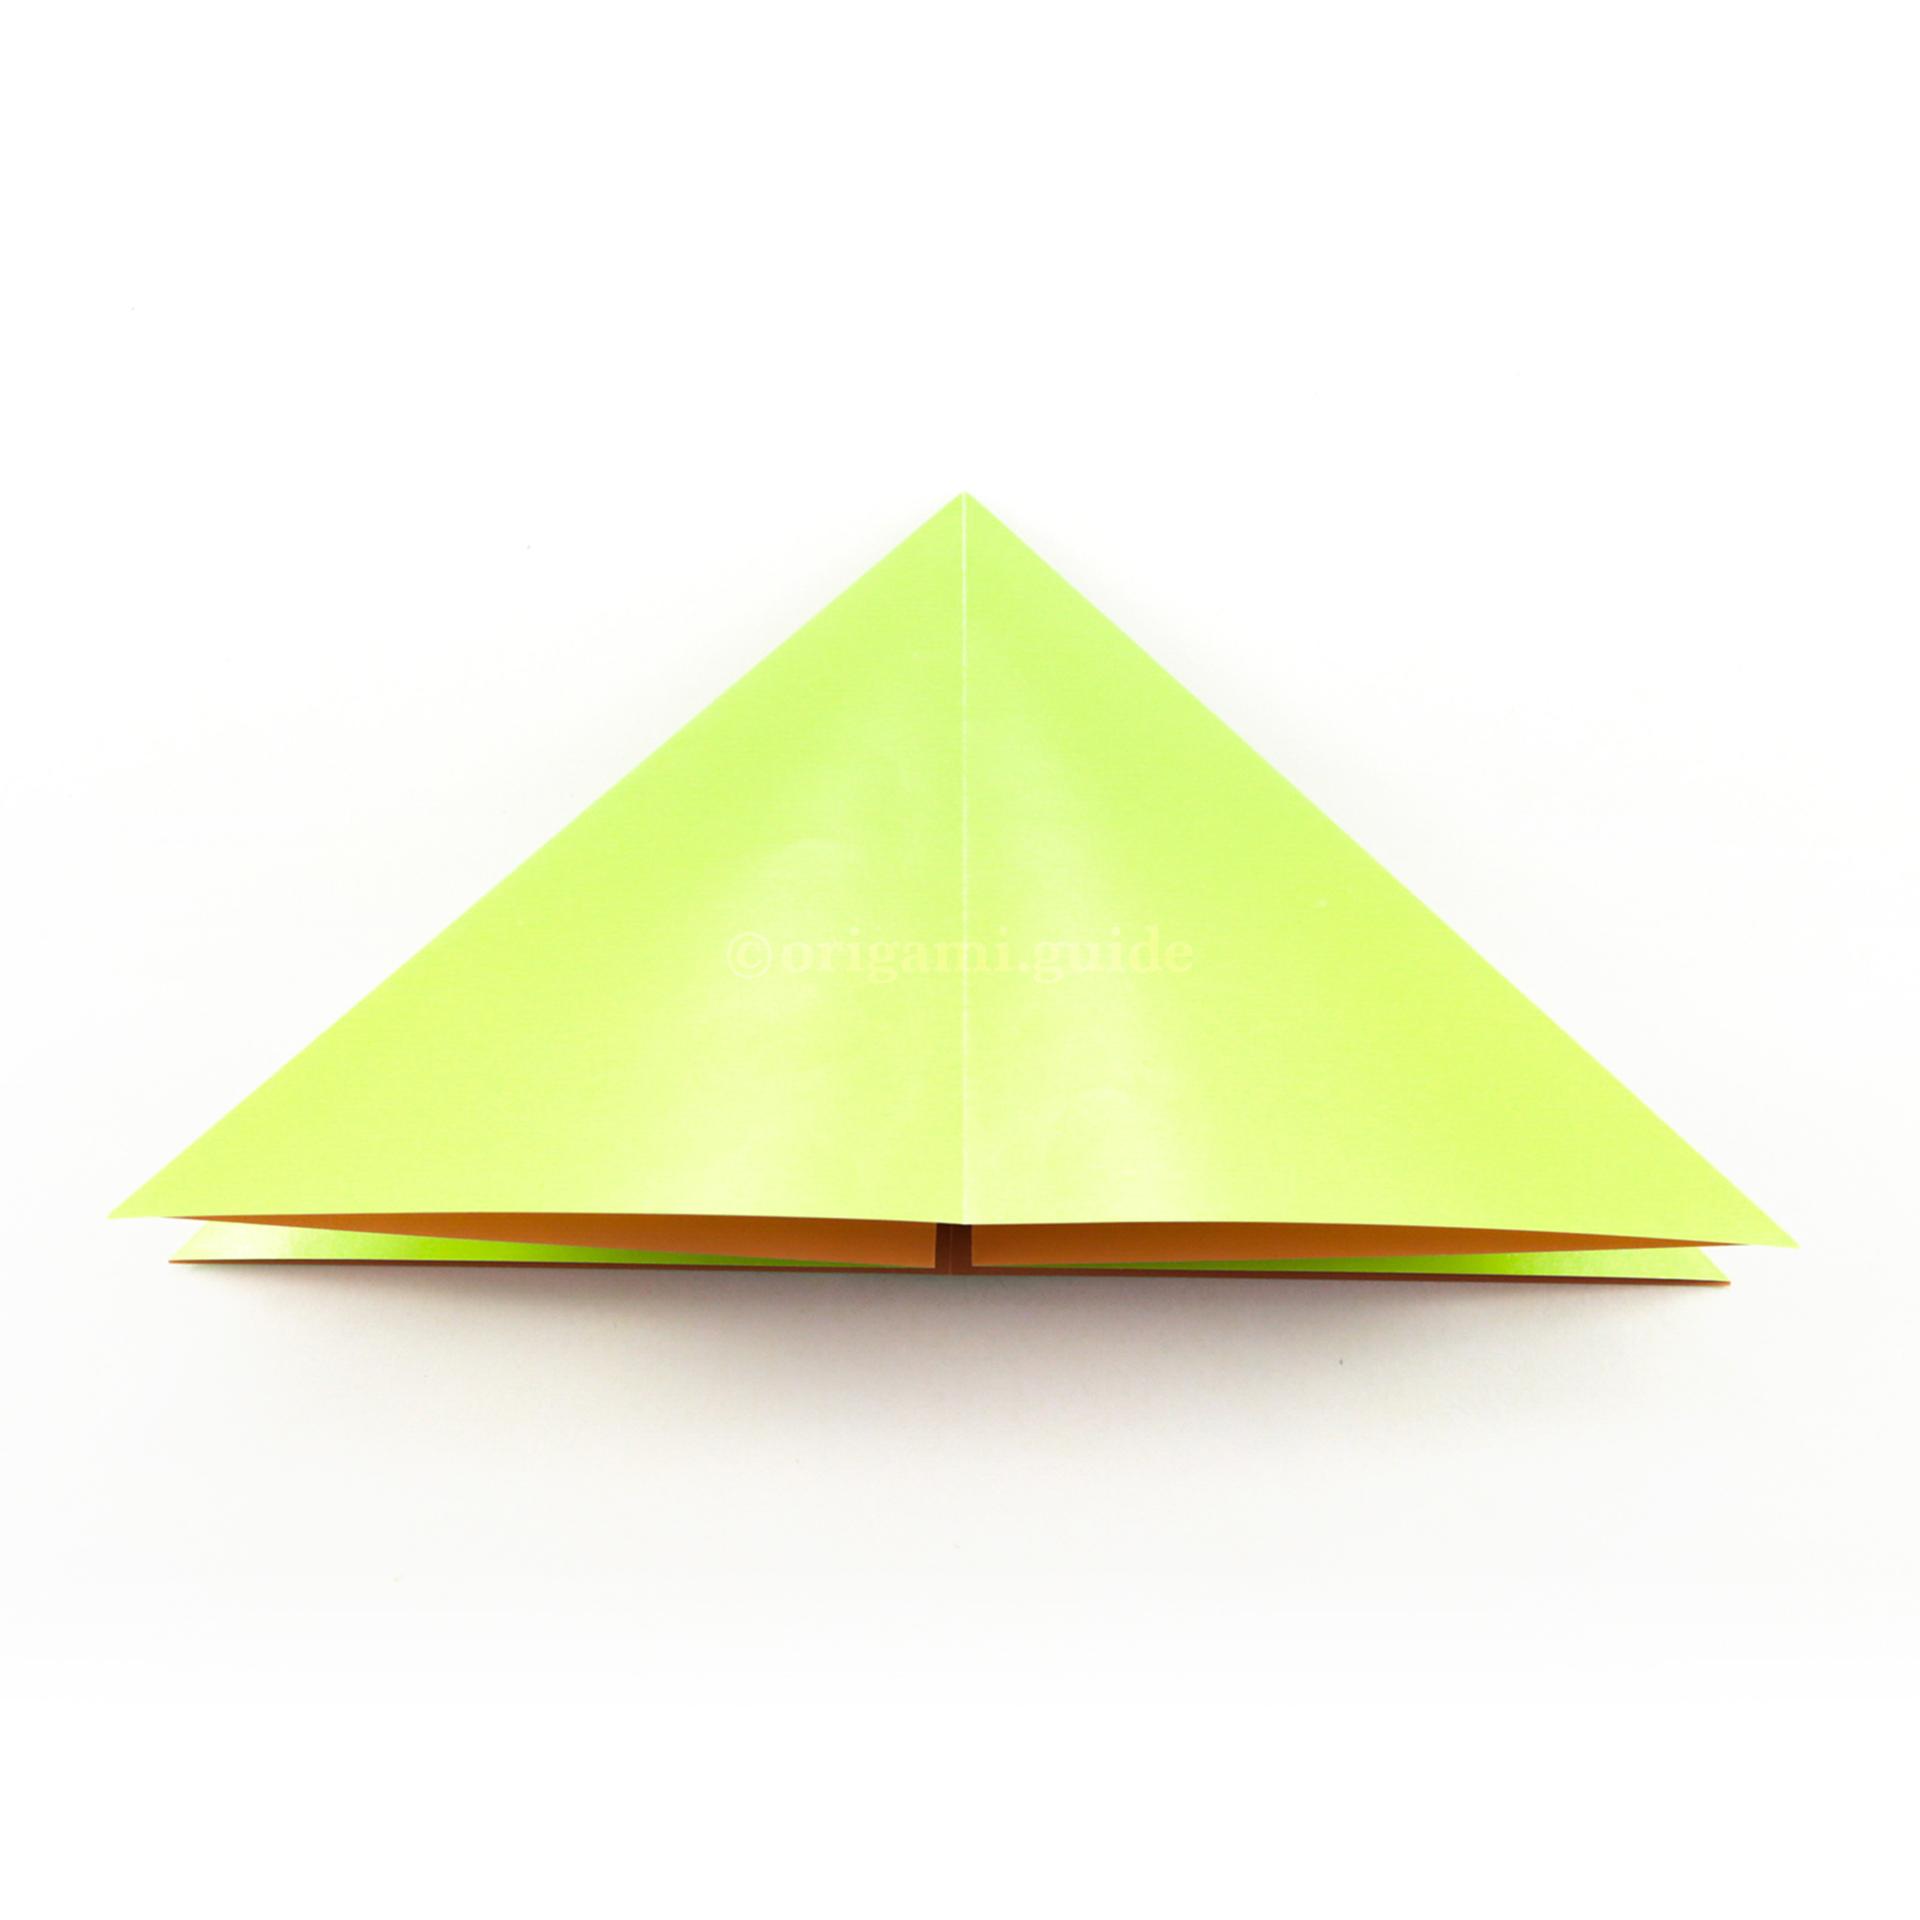 Origami Waterbomb Base | Origami water bomb, Star wars origami ... | 1920x1920